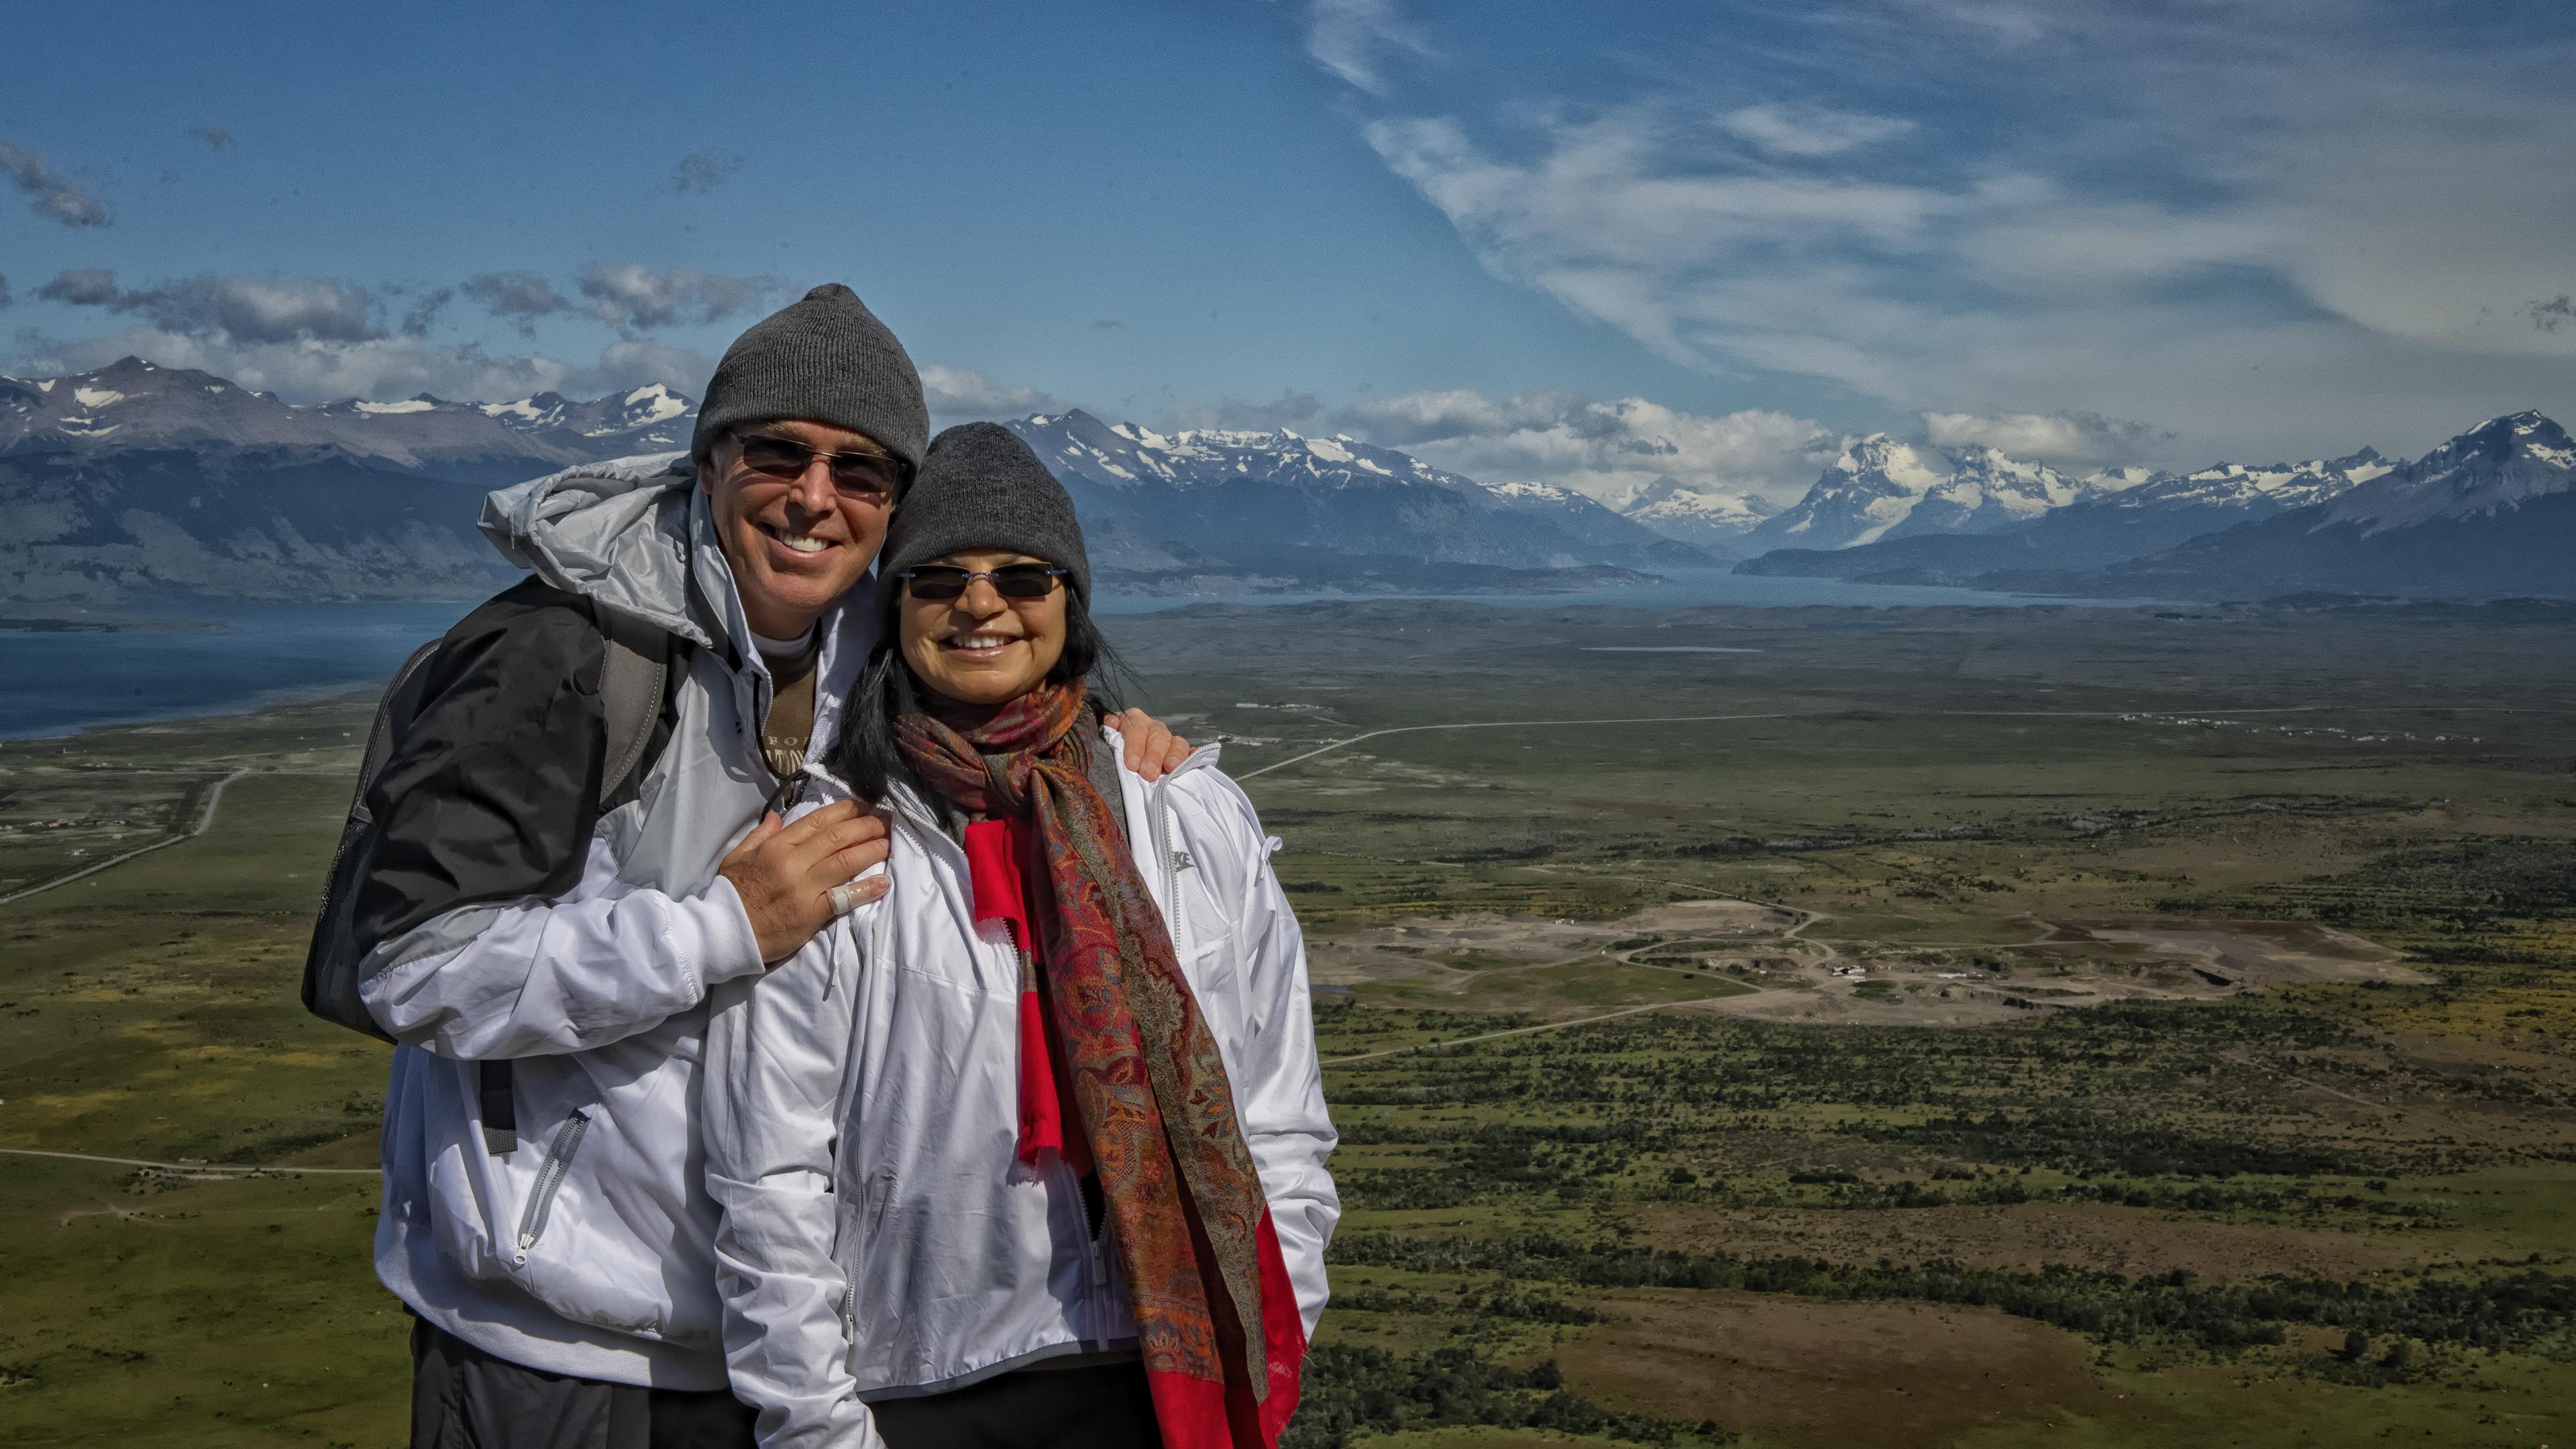 Enjoying the View at Cerro Dorotea